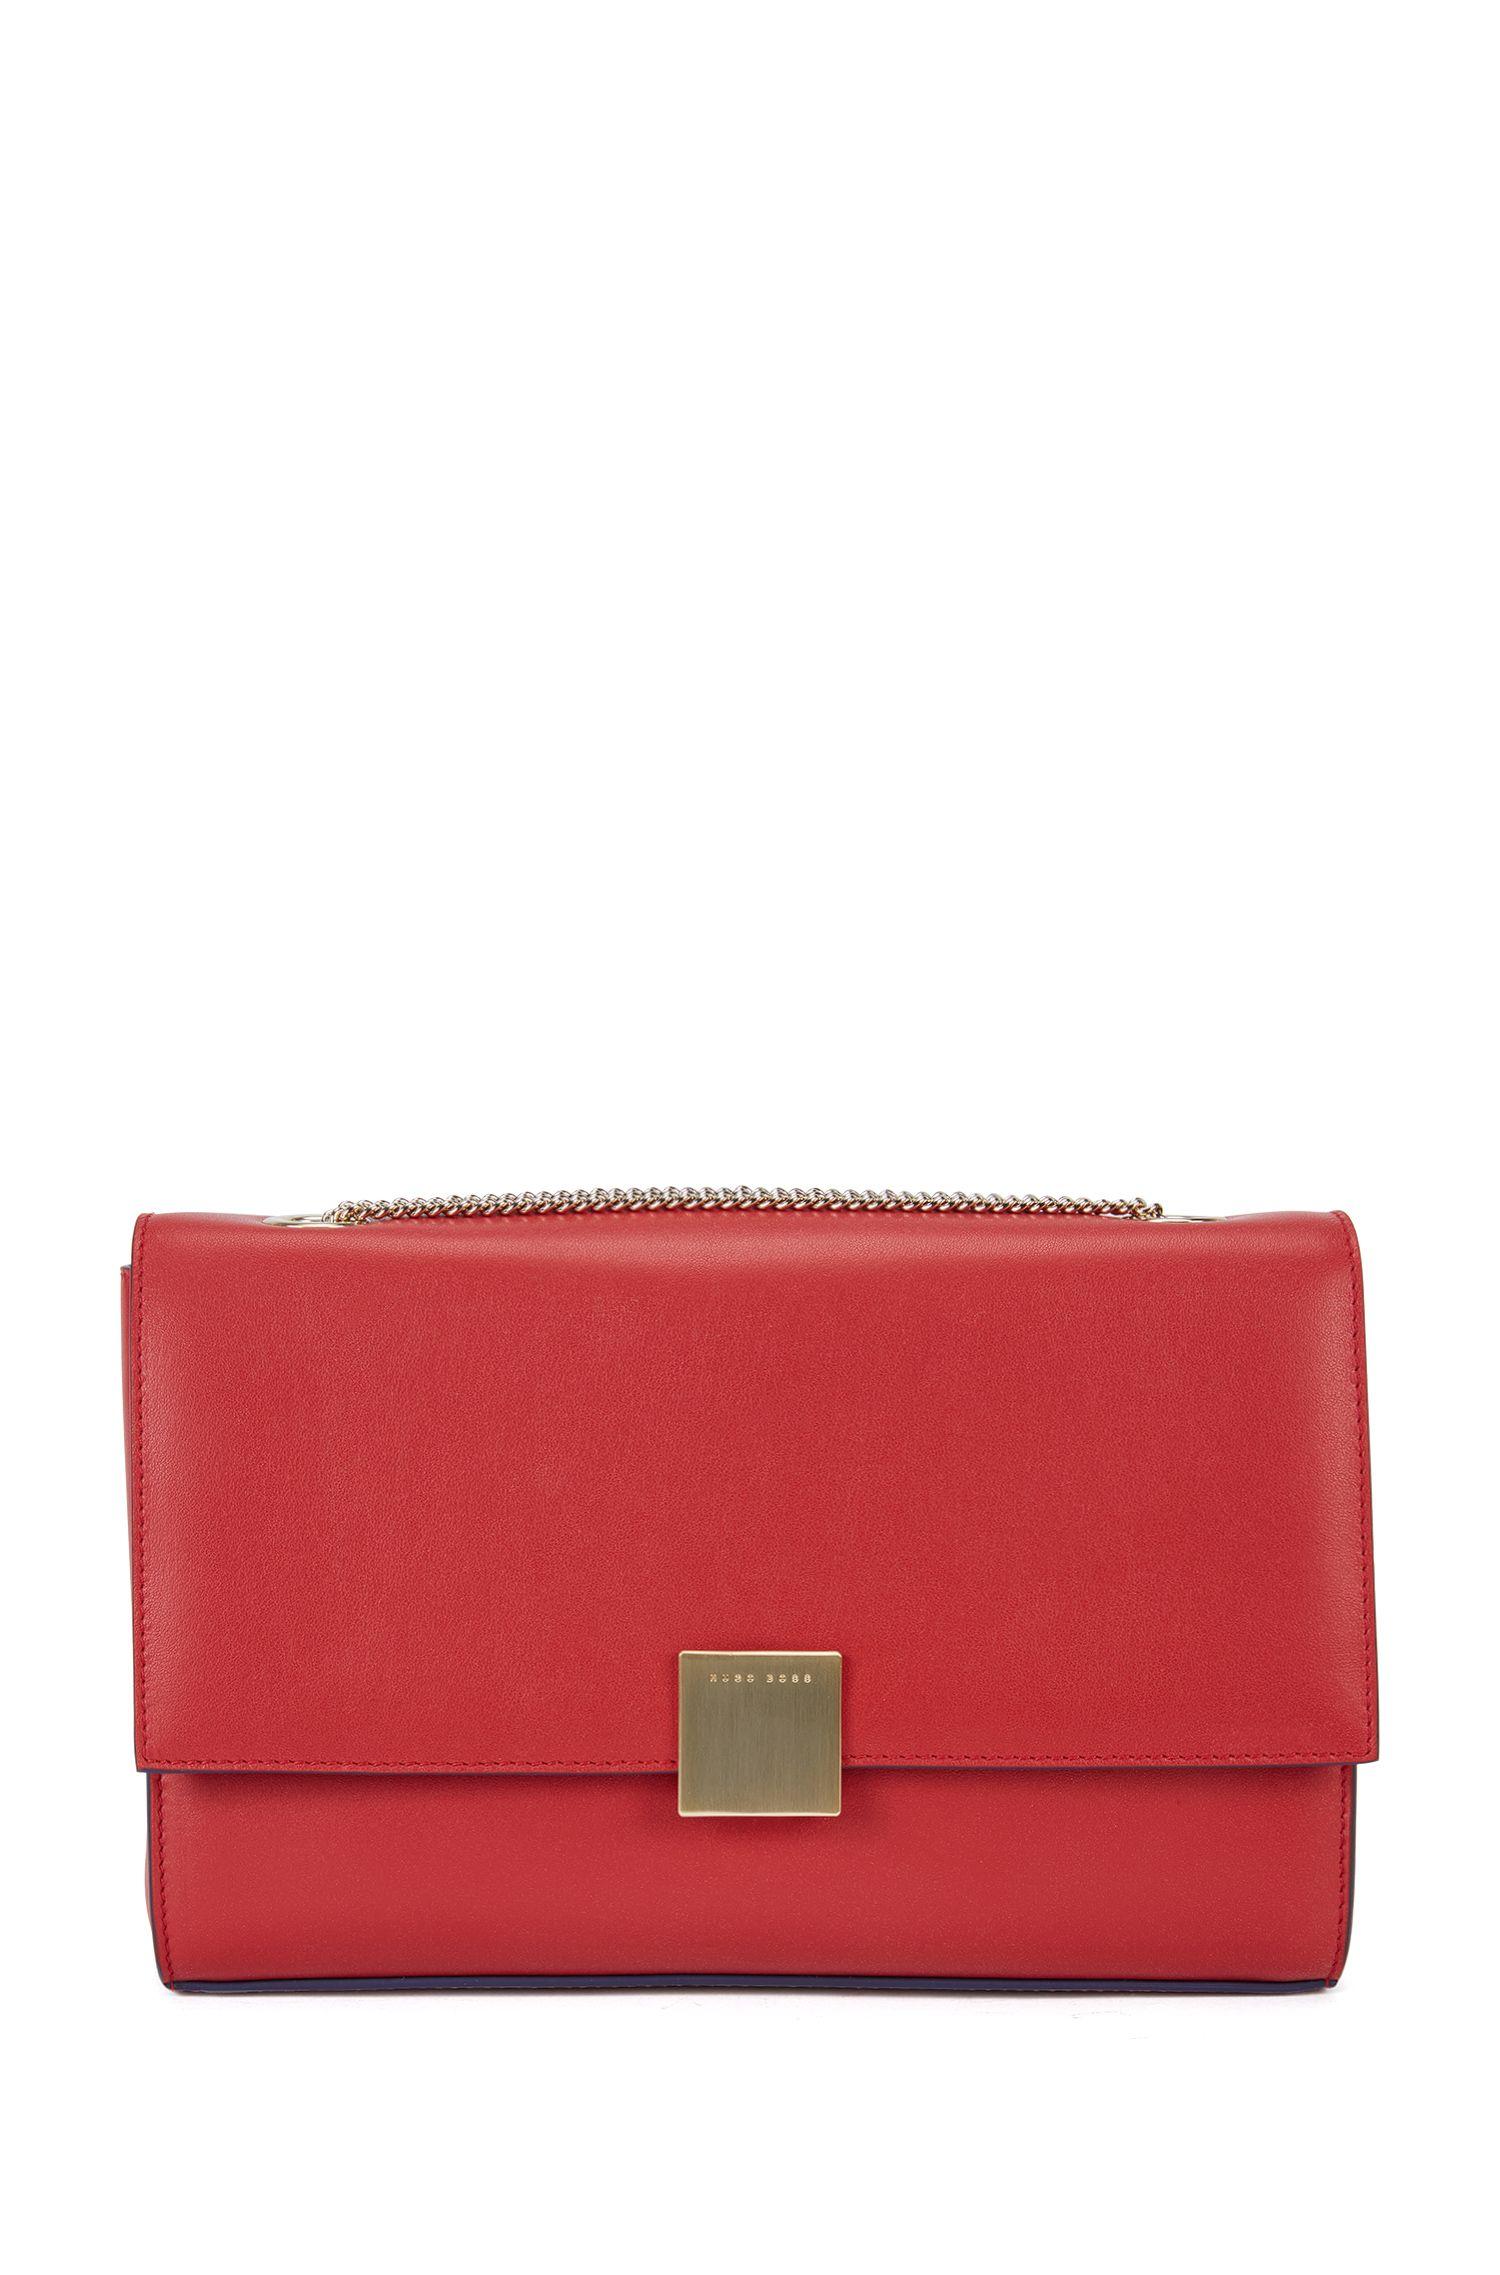 'Munich Flap N' | Italian Calfskin Handbag, Chain Strap